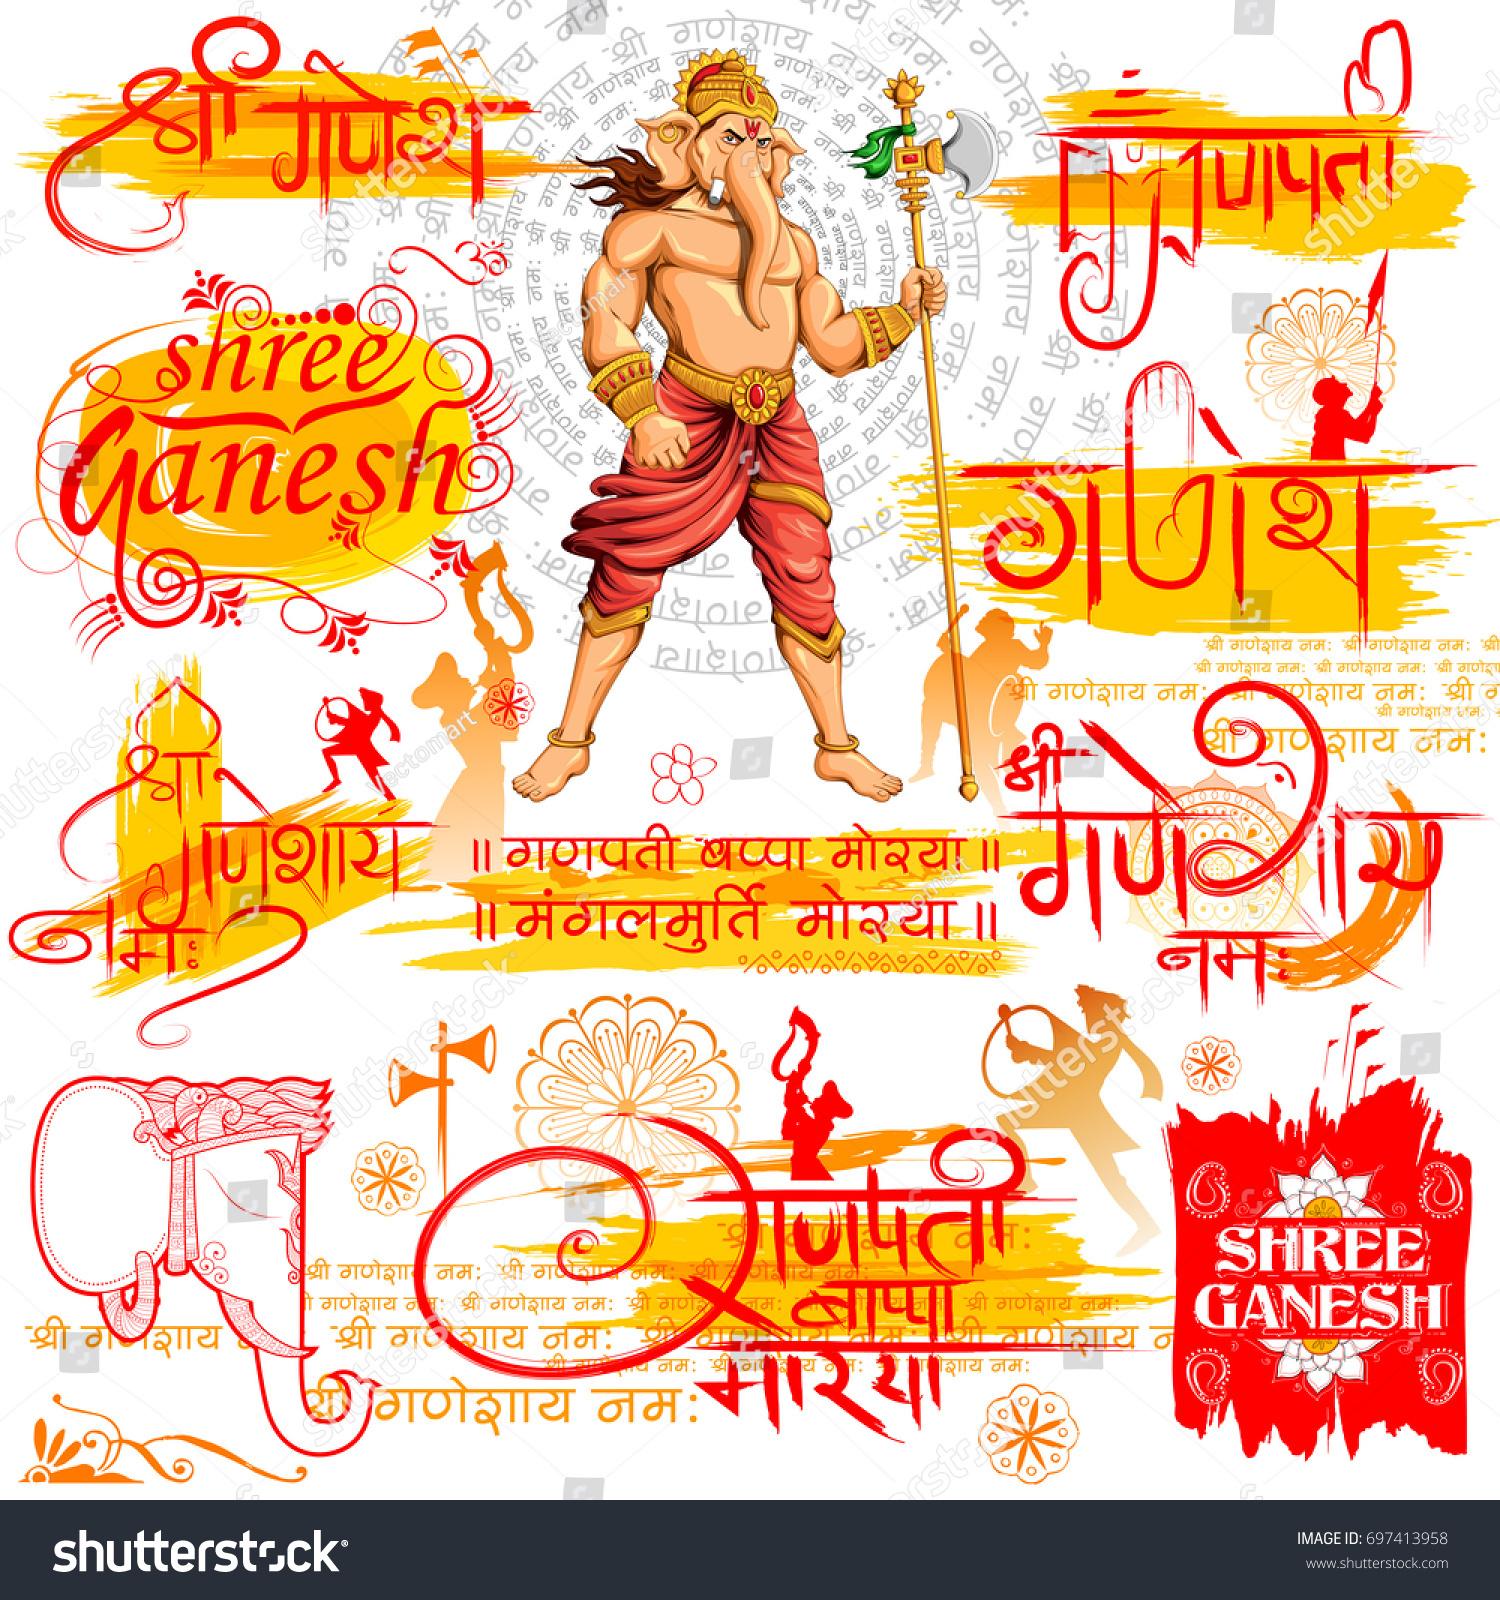 Illustration lord ganapati background ganesh chaturthi stock illustration of lord ganapati background for ganesh chaturthi with text in hindi ganpati bappa morya meaning buycottarizona